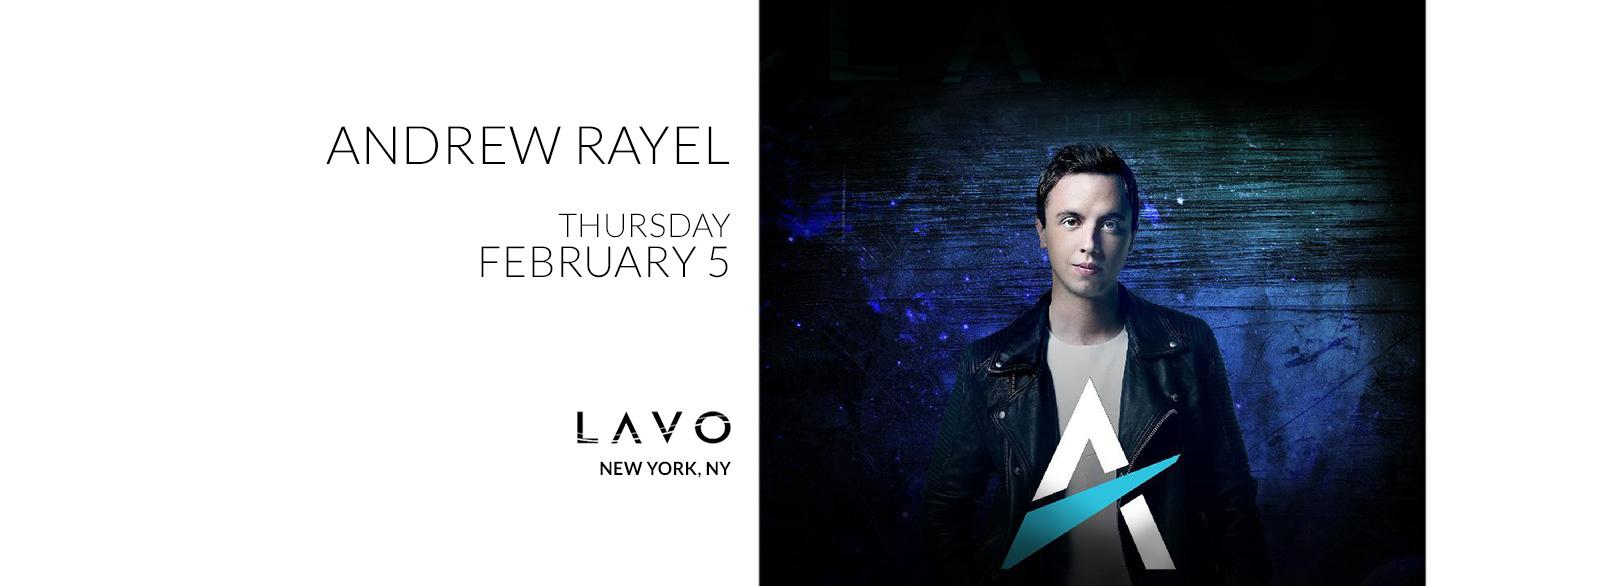 Andrew Rayel @ Lavo New York